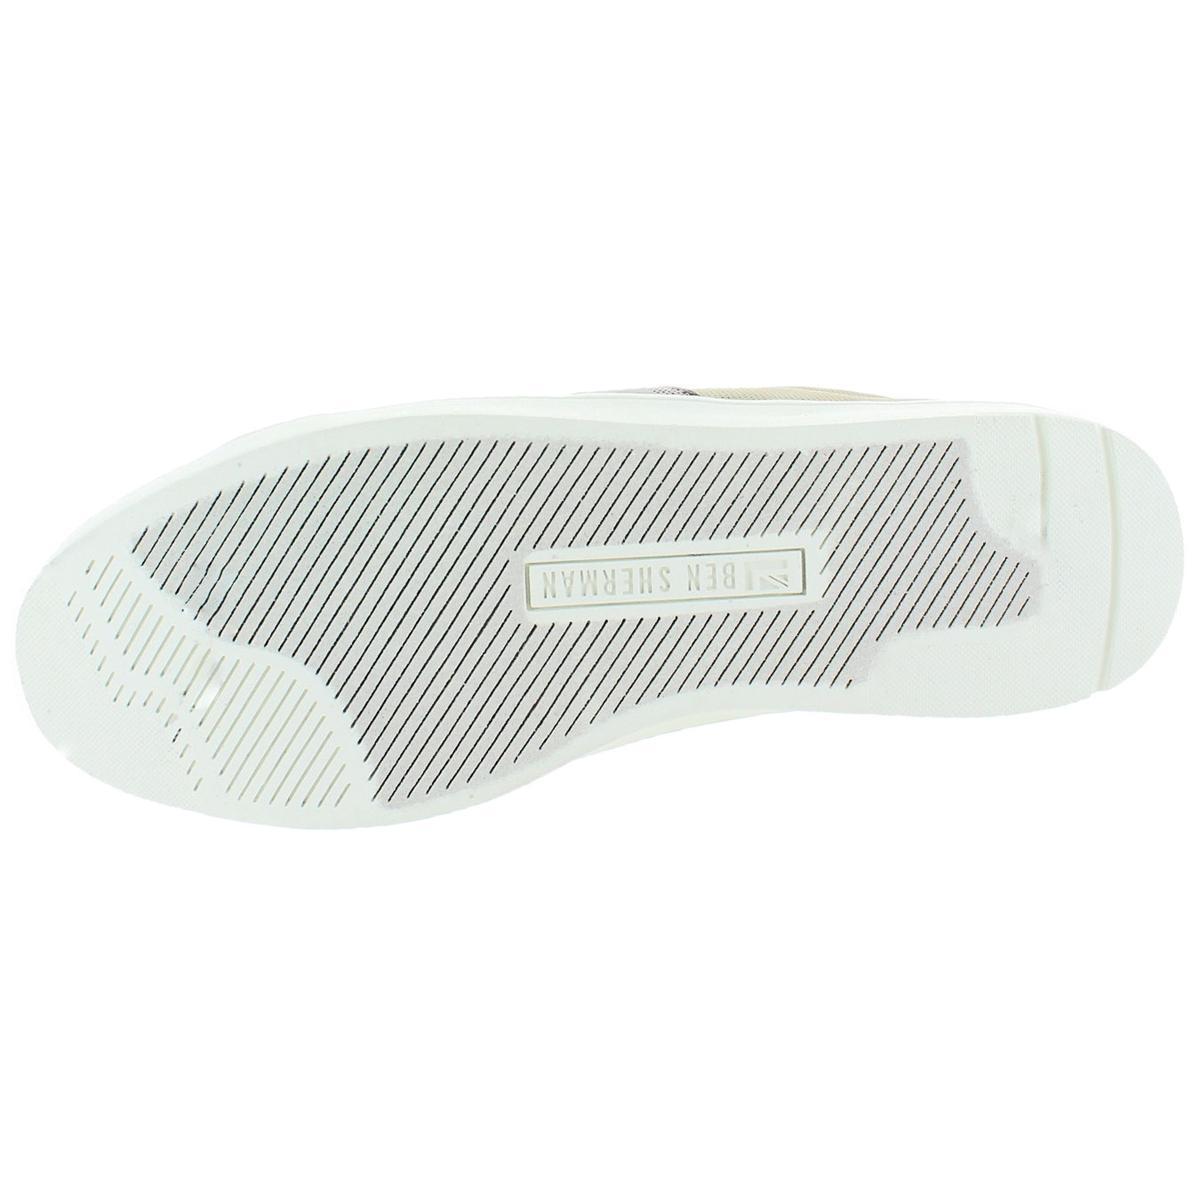 Ben-Sherman-Ashton-Men-039-s-Fashion-Court-Sneakers-Shoes thumbnail 9